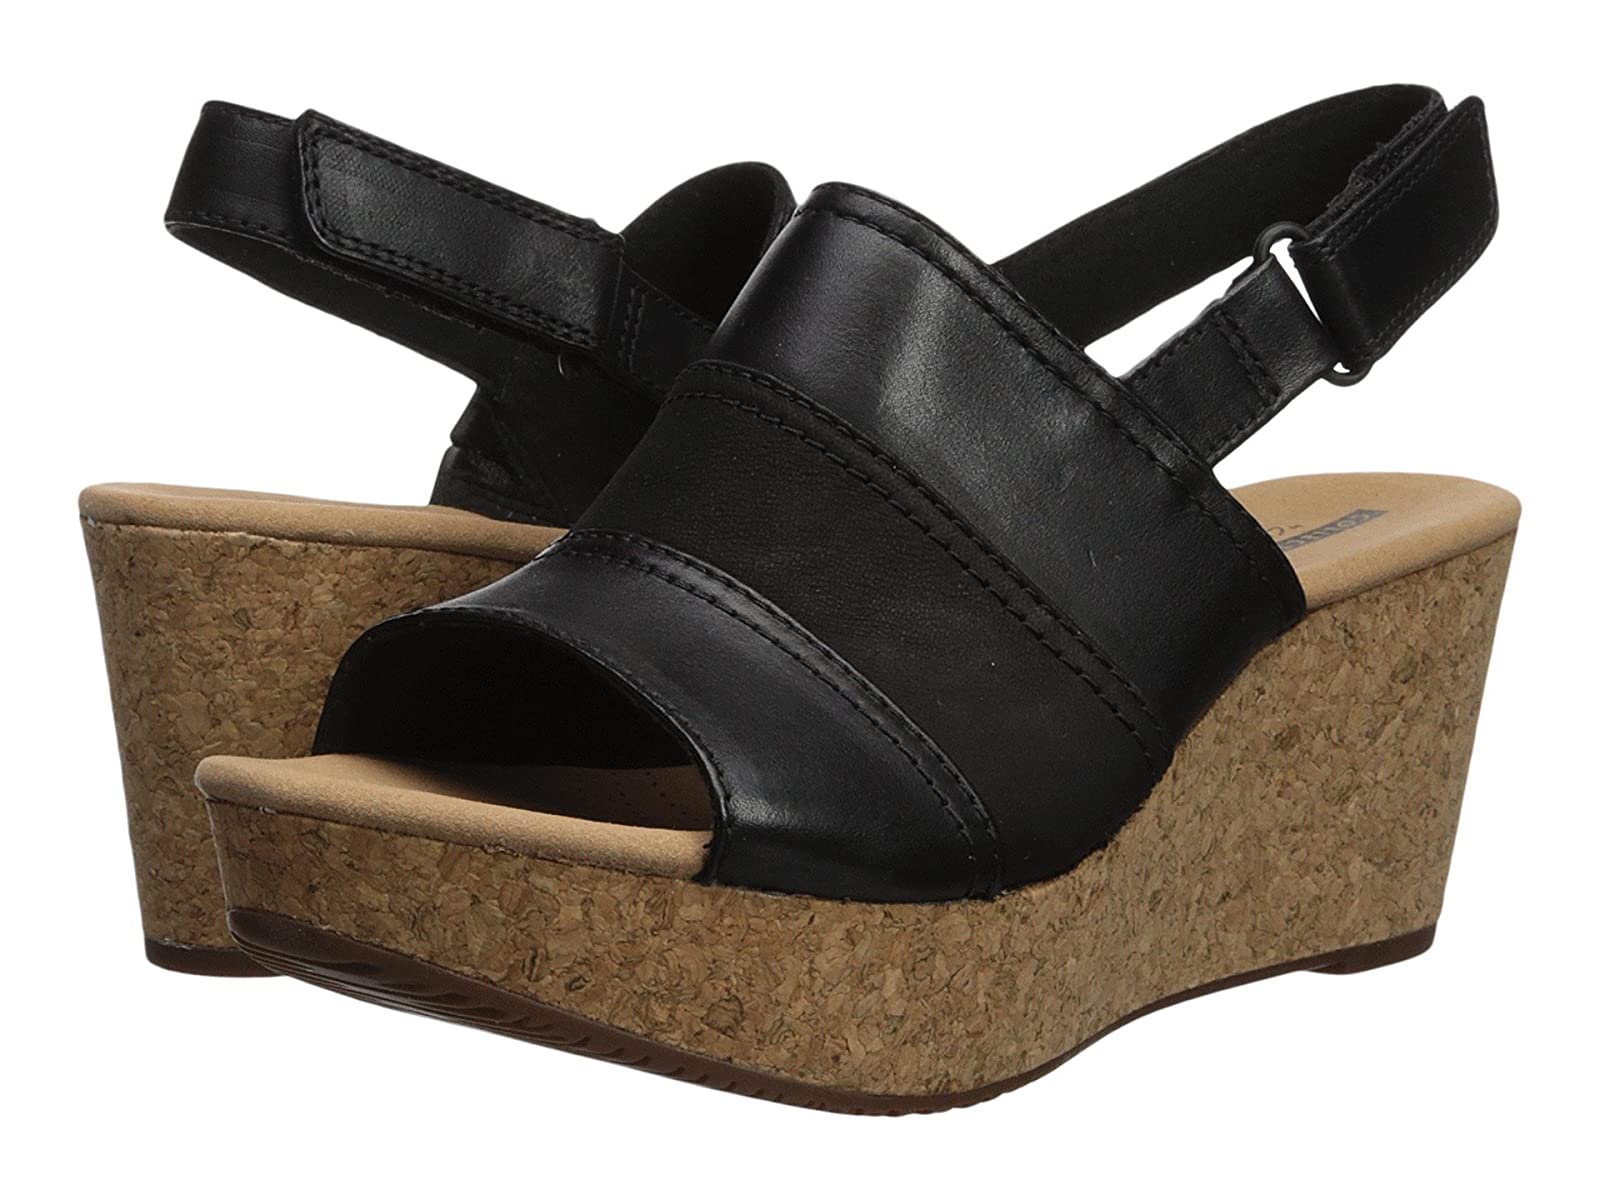 Clarks Annadel JanisCheap and distinctive eye-catching shoes